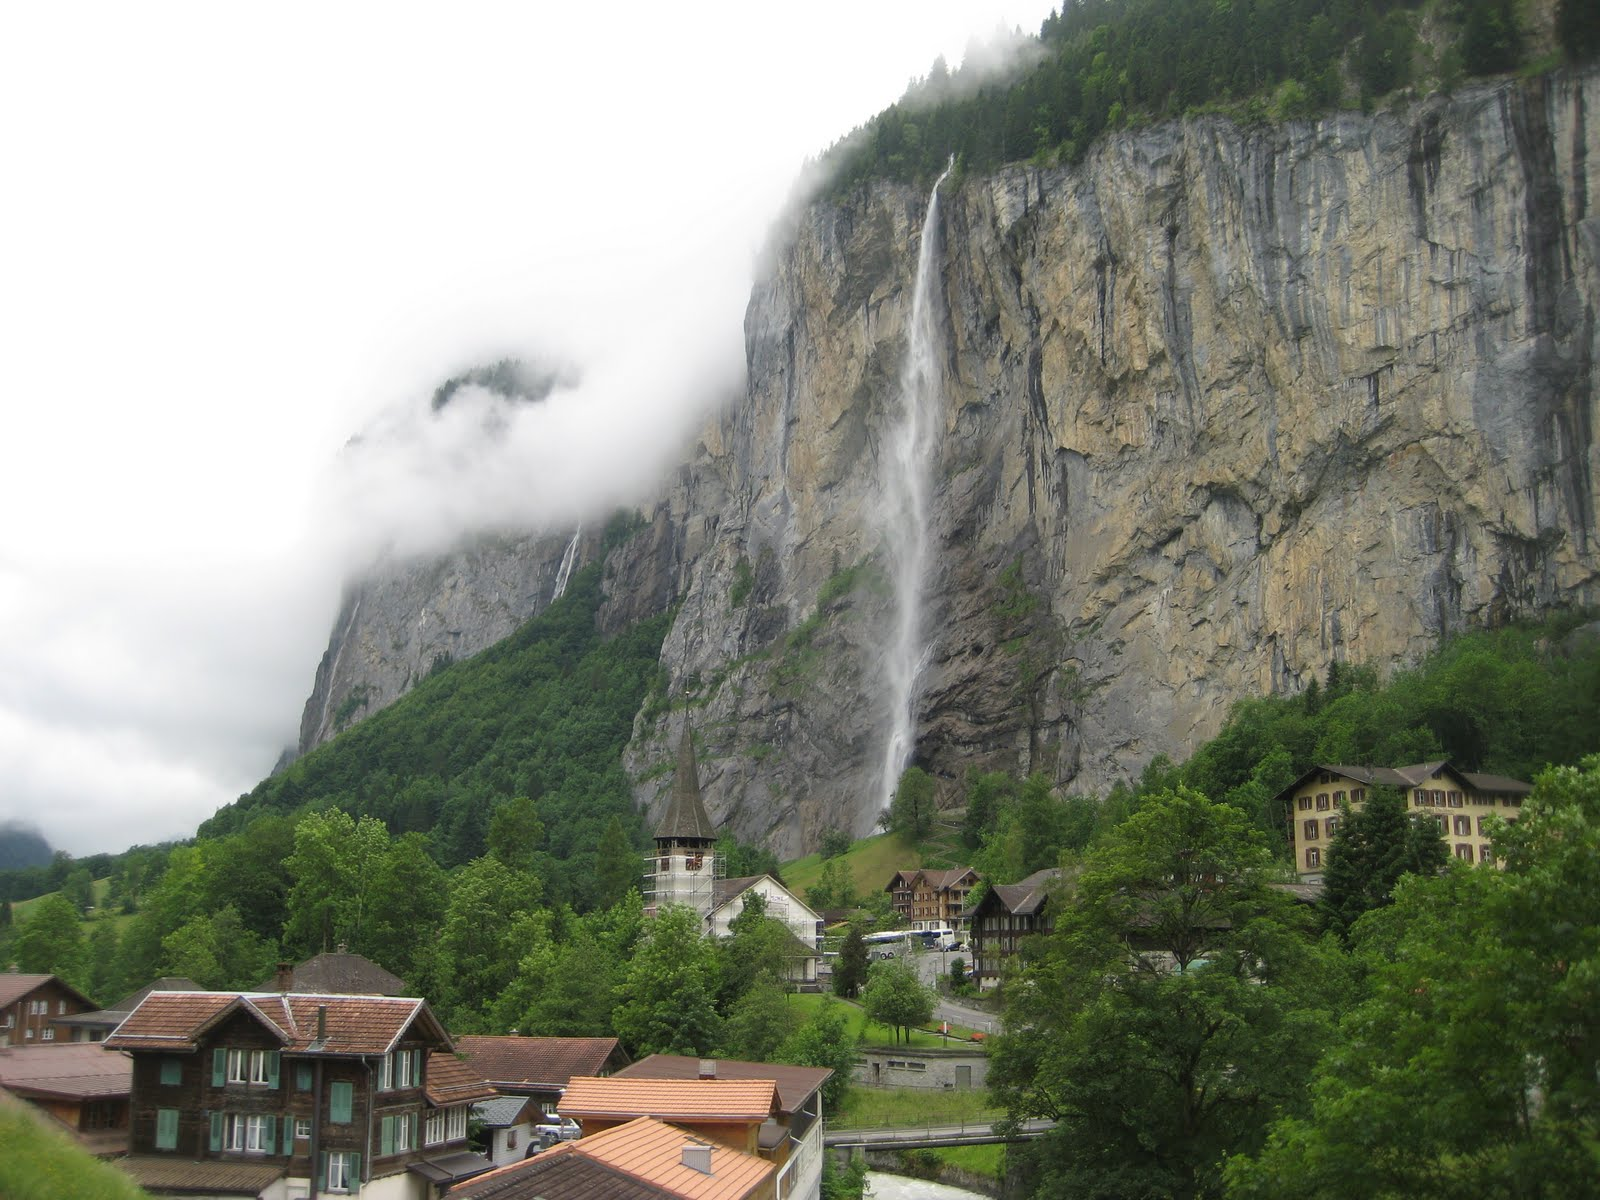 Snoqualmie Falls Wallpaper Incredible Staubbach Falls Switzerland World For Travel